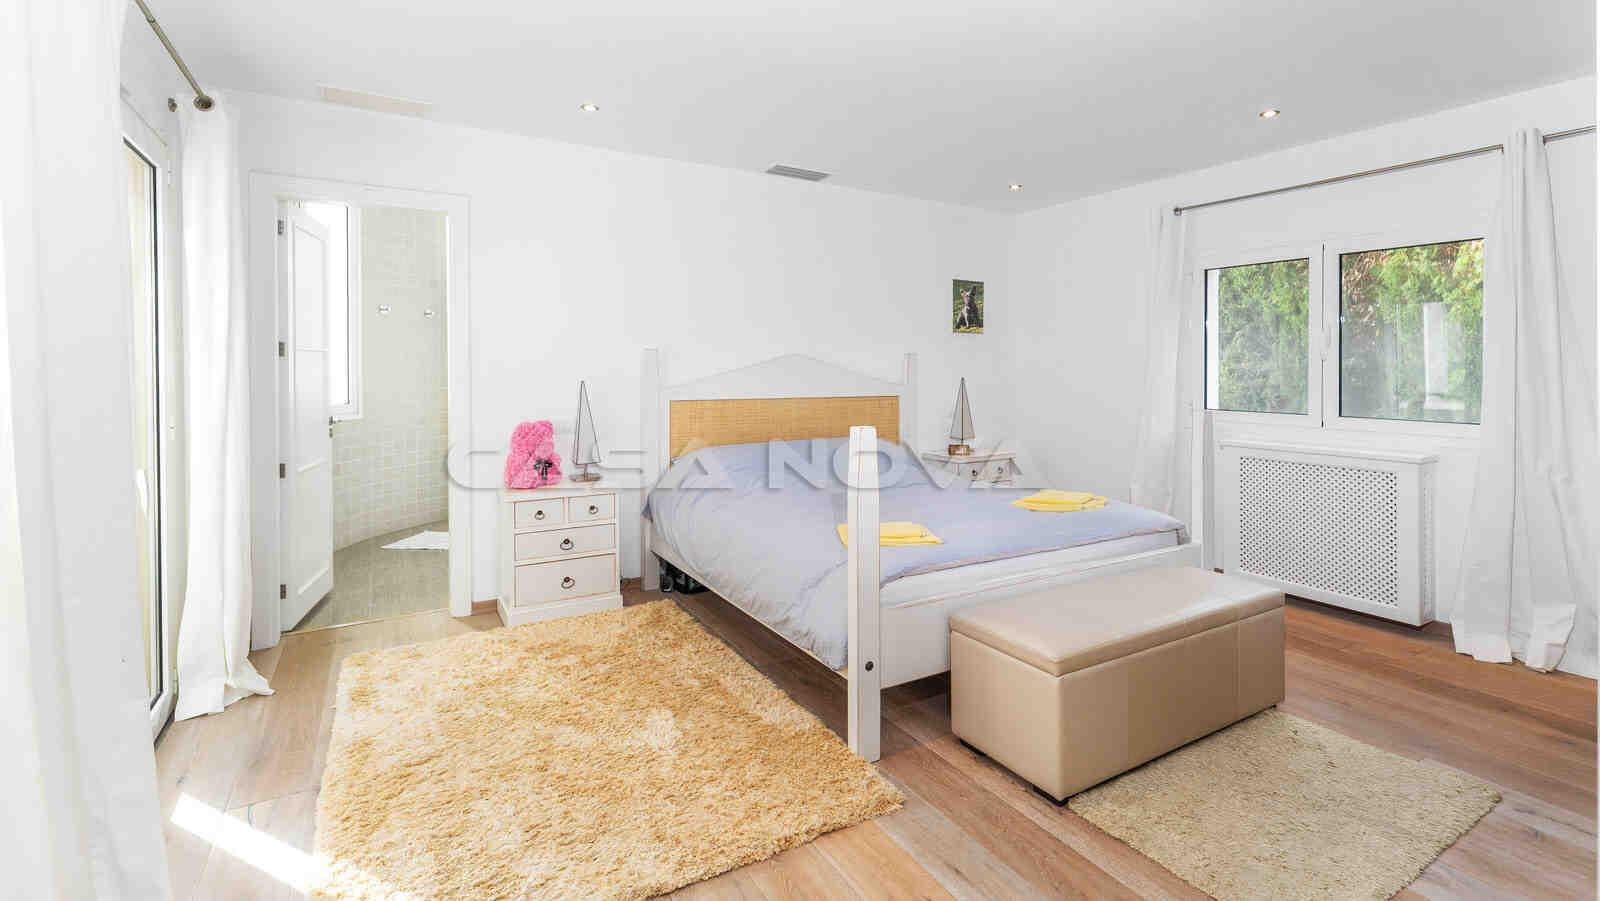 Helles Schlafzimmer mit Bad en Suite